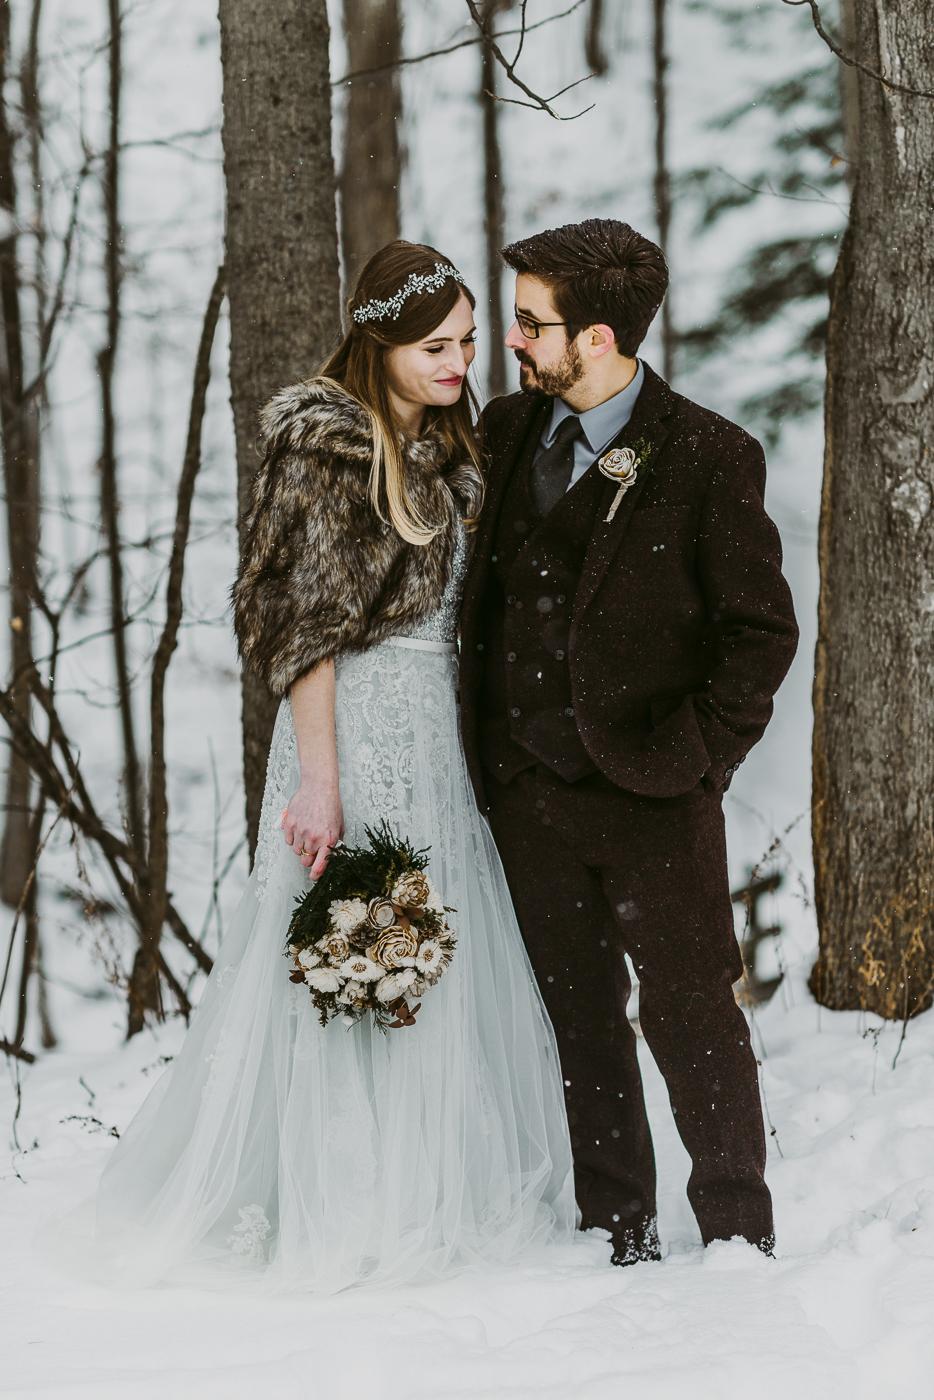 Squires-Castle-Winter-Wedding-19.jpg